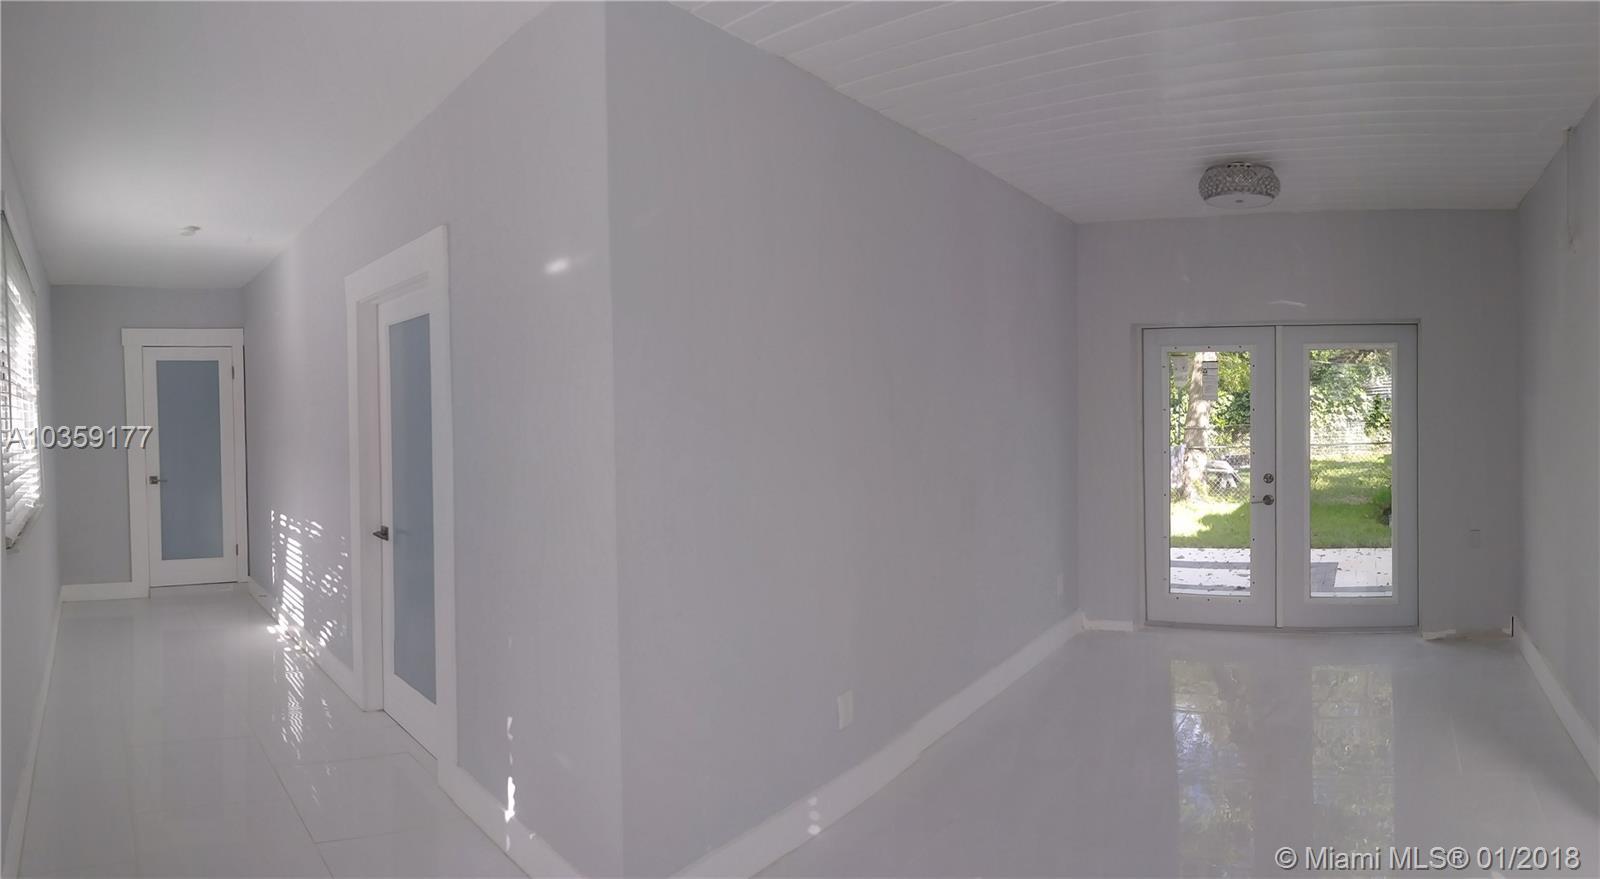 115 NE 88th St, El Portal , FL 33138